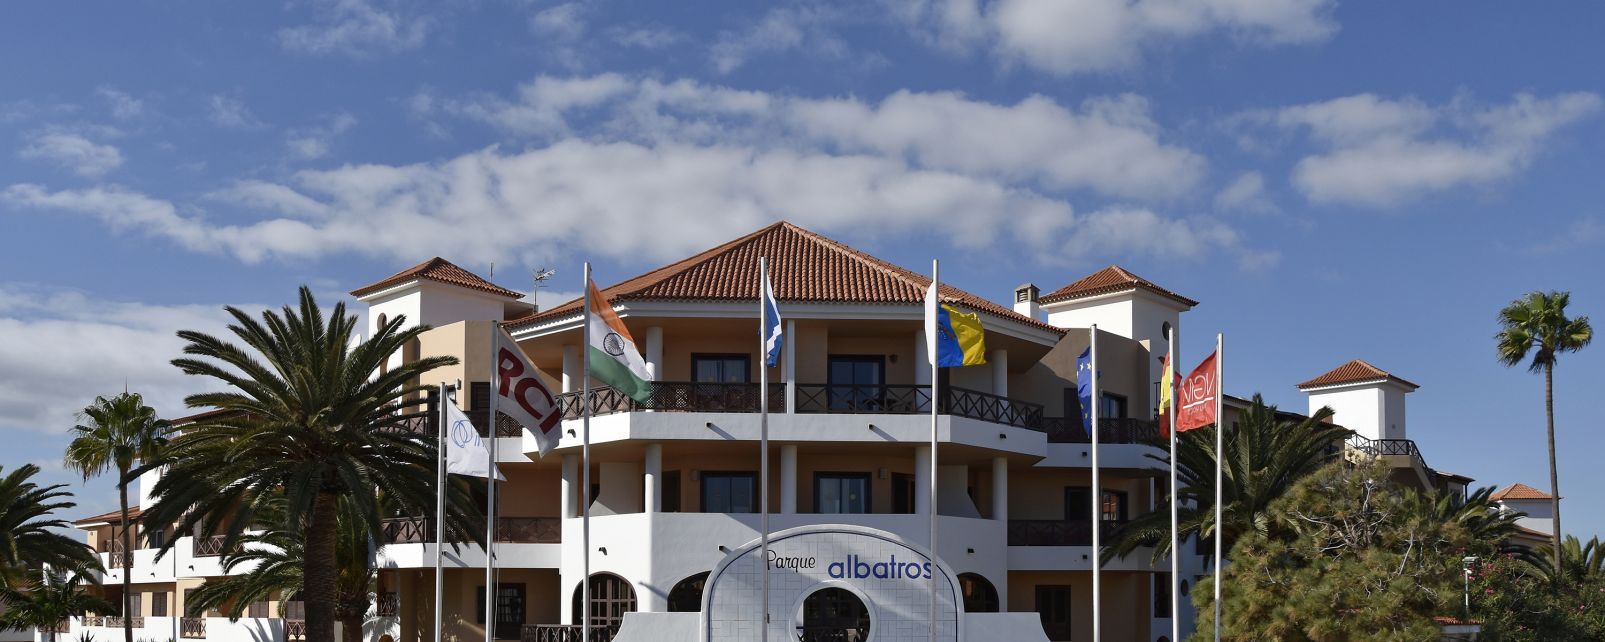 Hôtel Muthu Royal Park Albatros